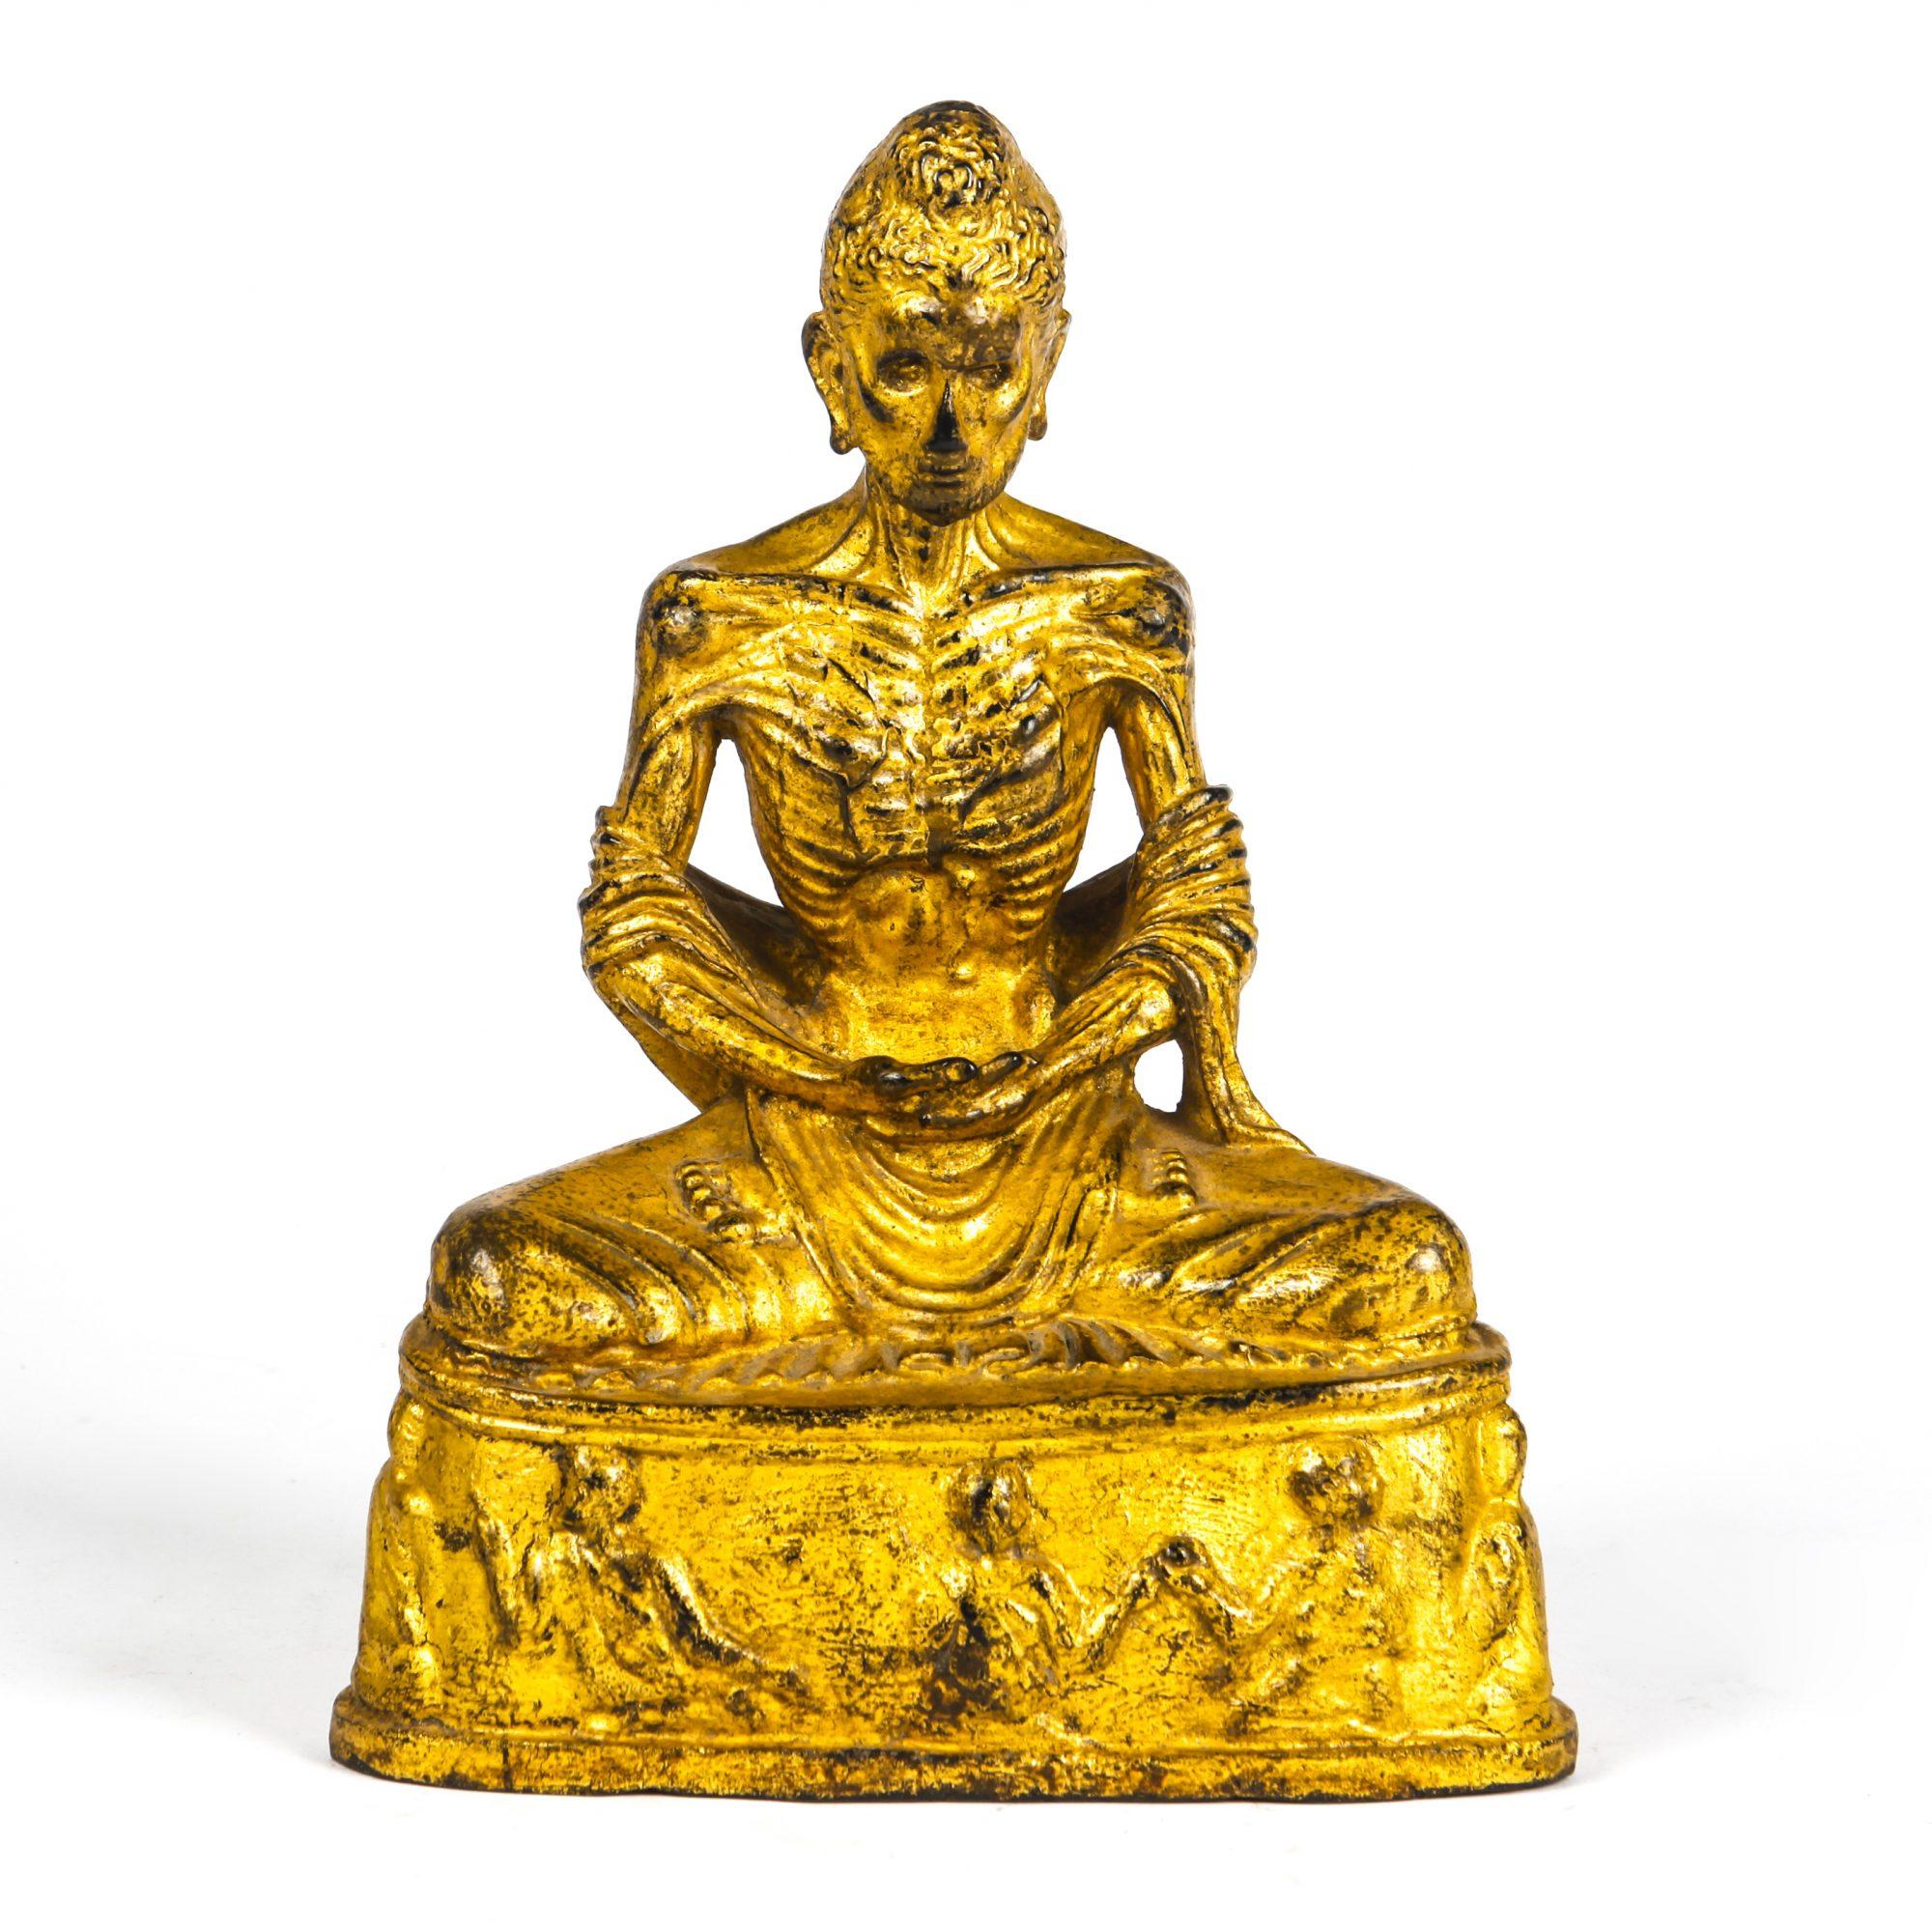 THAI LACQUER GILT GANDHARAN STYLE EMACIATED BUDDHA